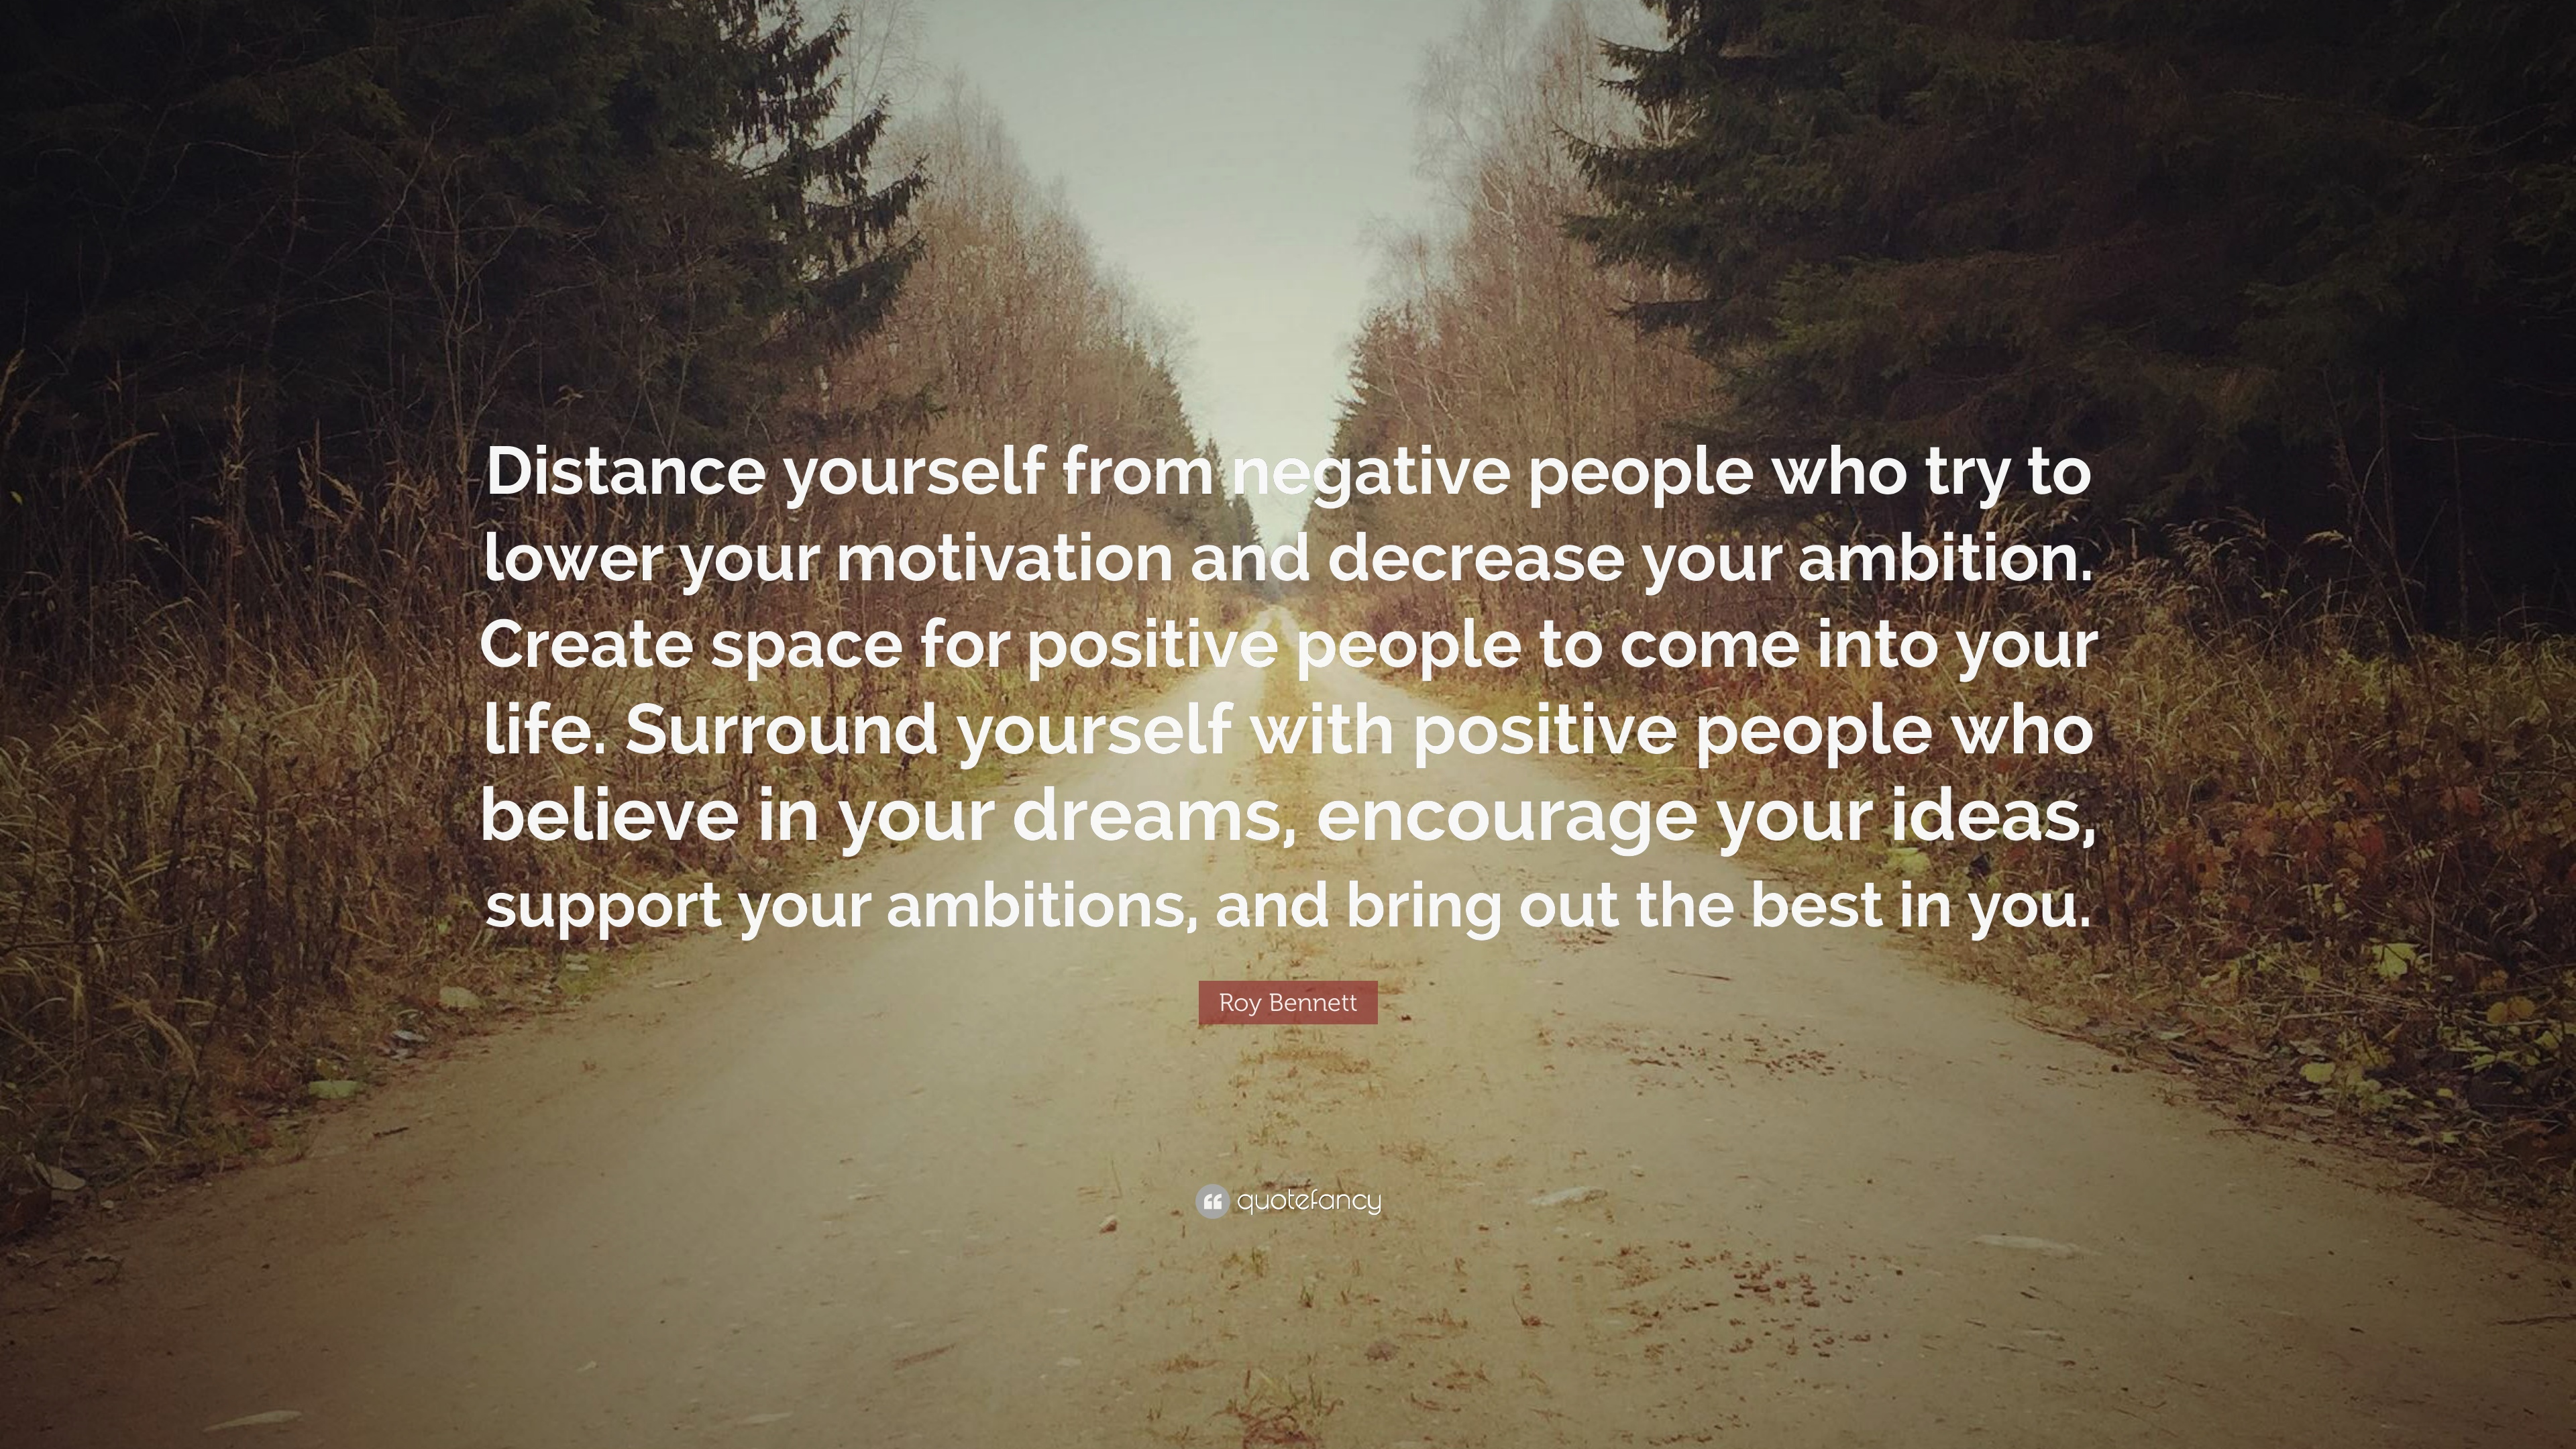 Positive People Quotes Positive People Quotes Awesome Best 25 Positive People Quotes